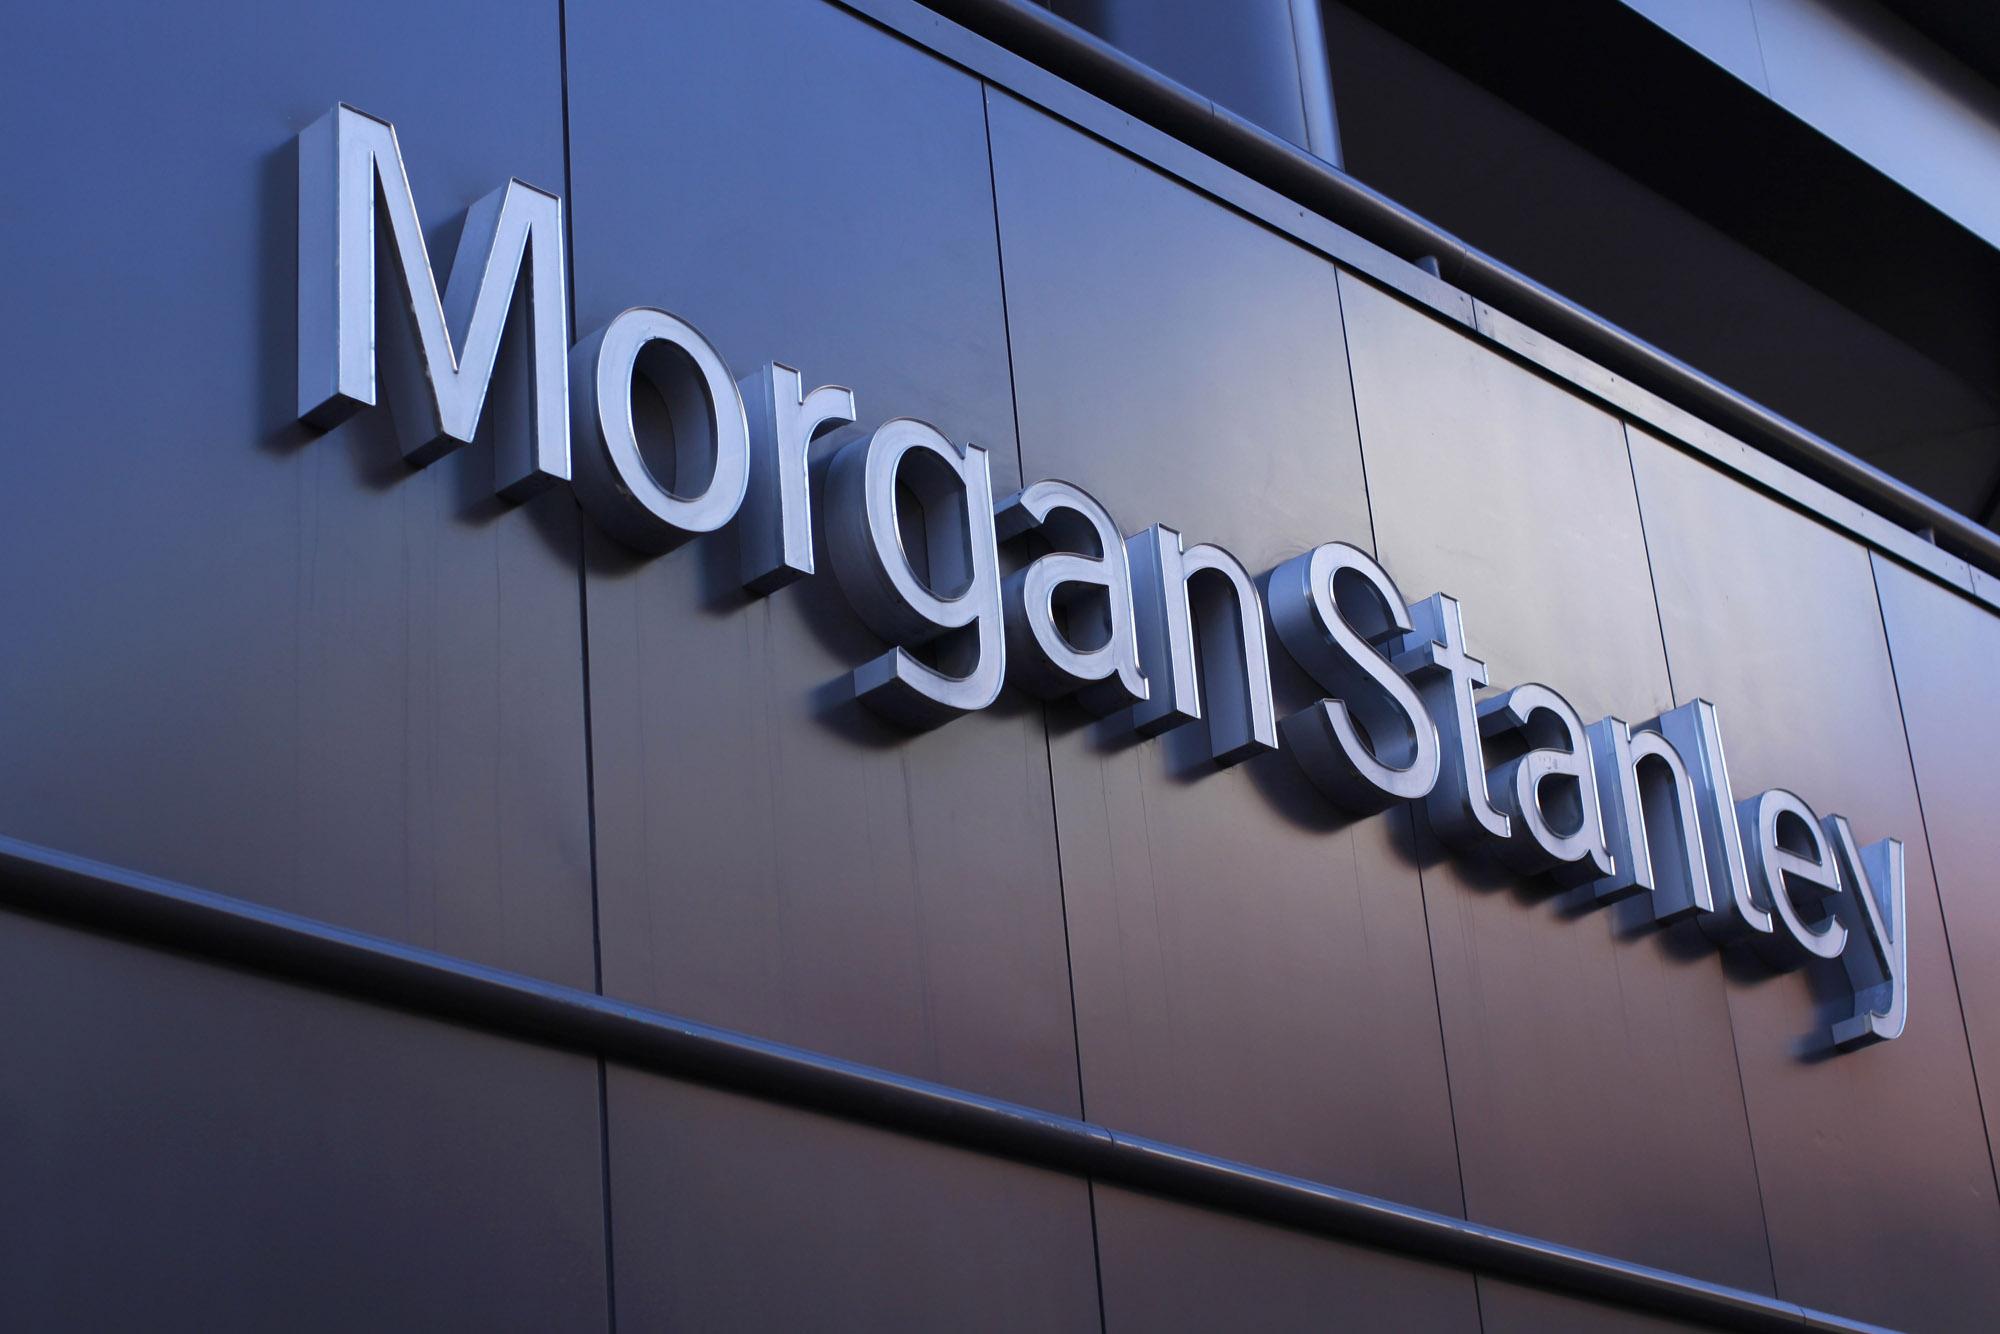 Morgan Stanley - Finance Internship Program - Pannon Egyetem - GTK